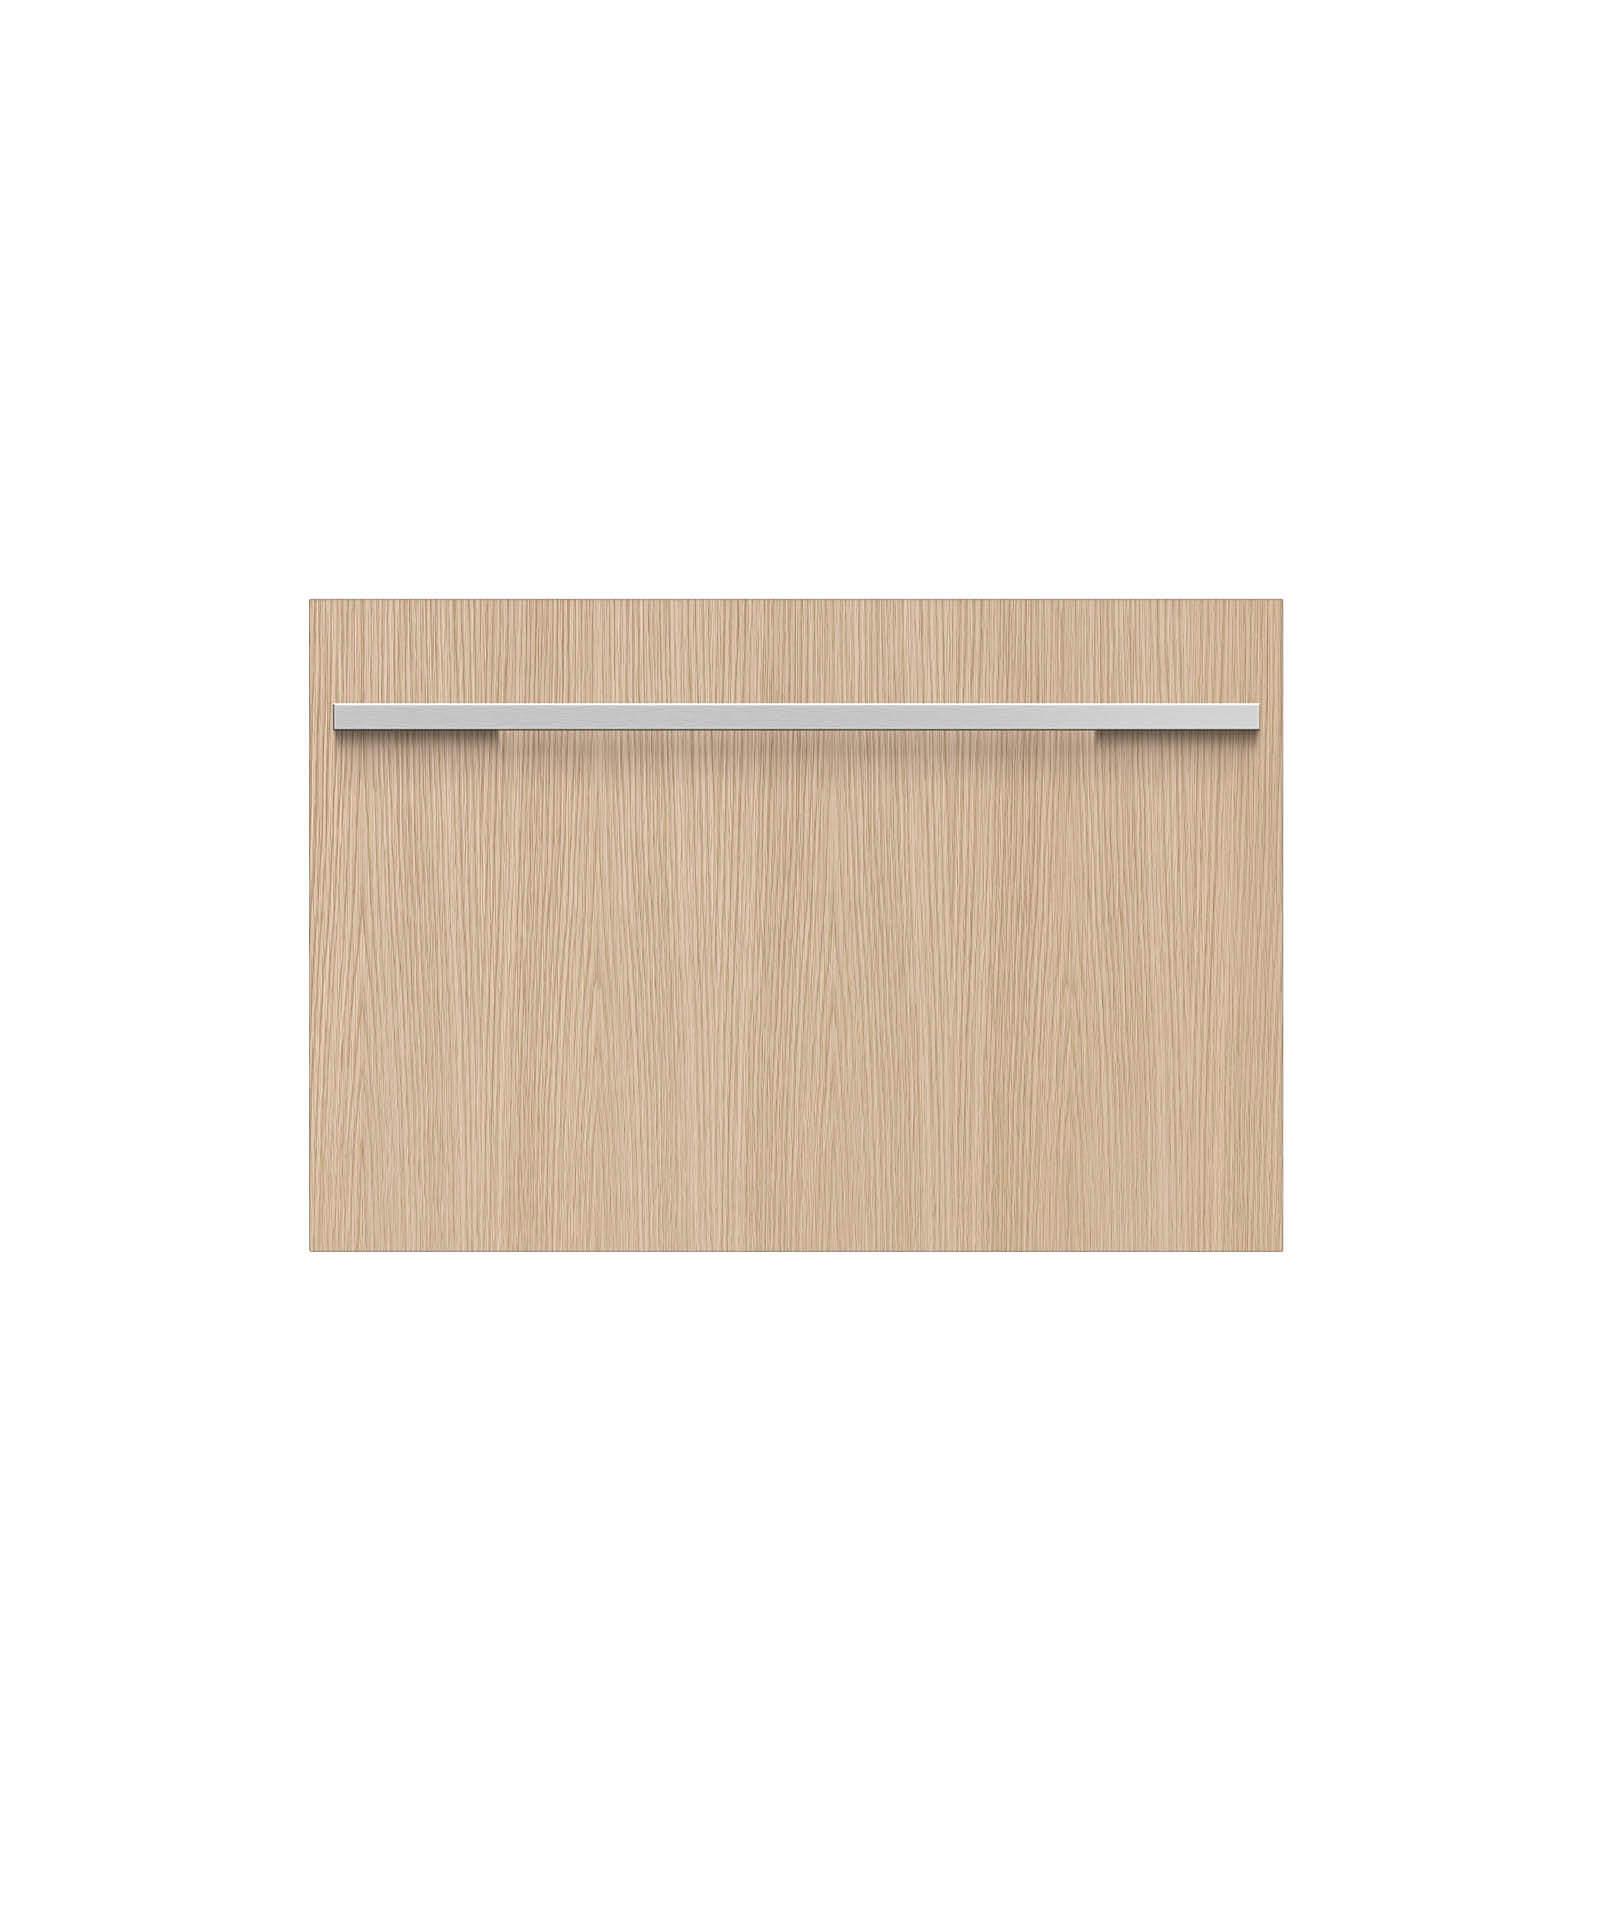 Single DishDrawer™ Dishwasher, 7 Place Settings, Panel Ready